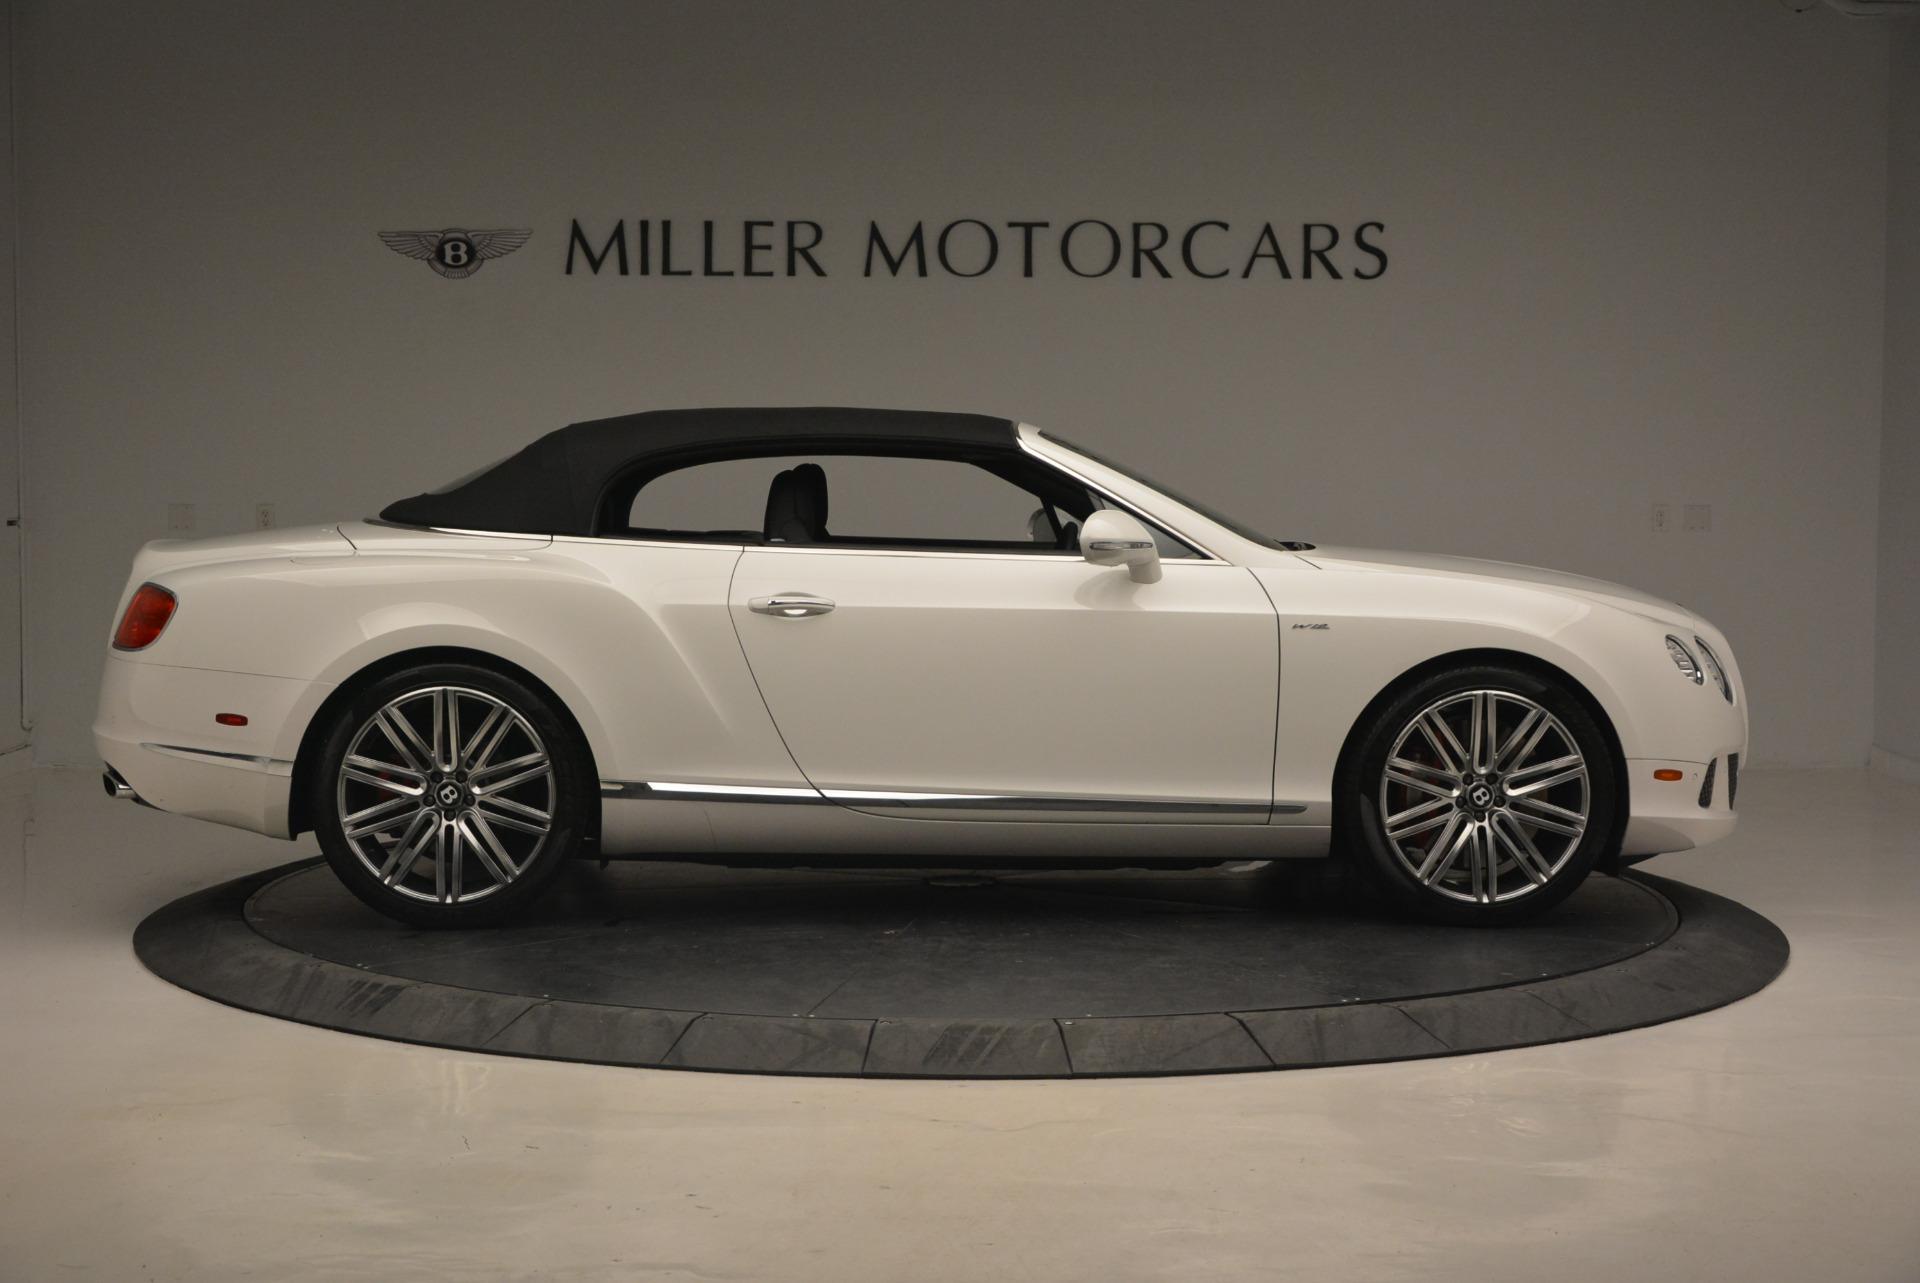 Used 2014 Bentley Continental GT Speed For Sale In Westport, CT 1129_p21